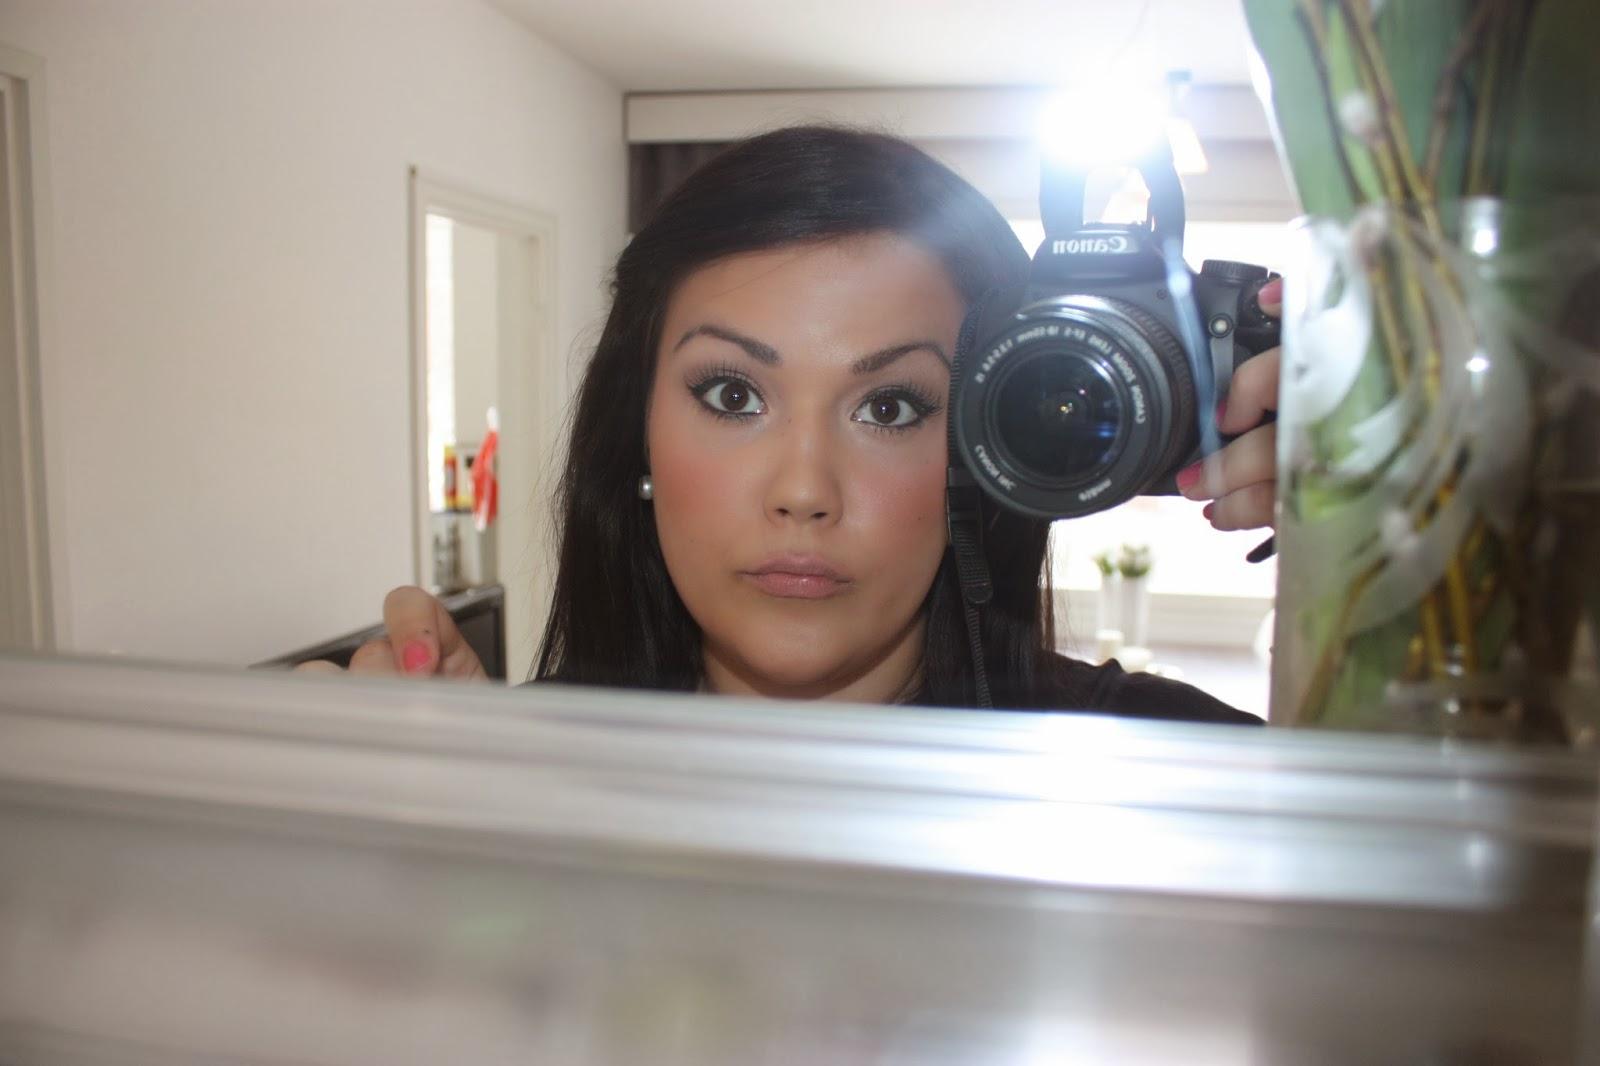 Selfies 2005-2013 - Piparin maailma 70a861ffff